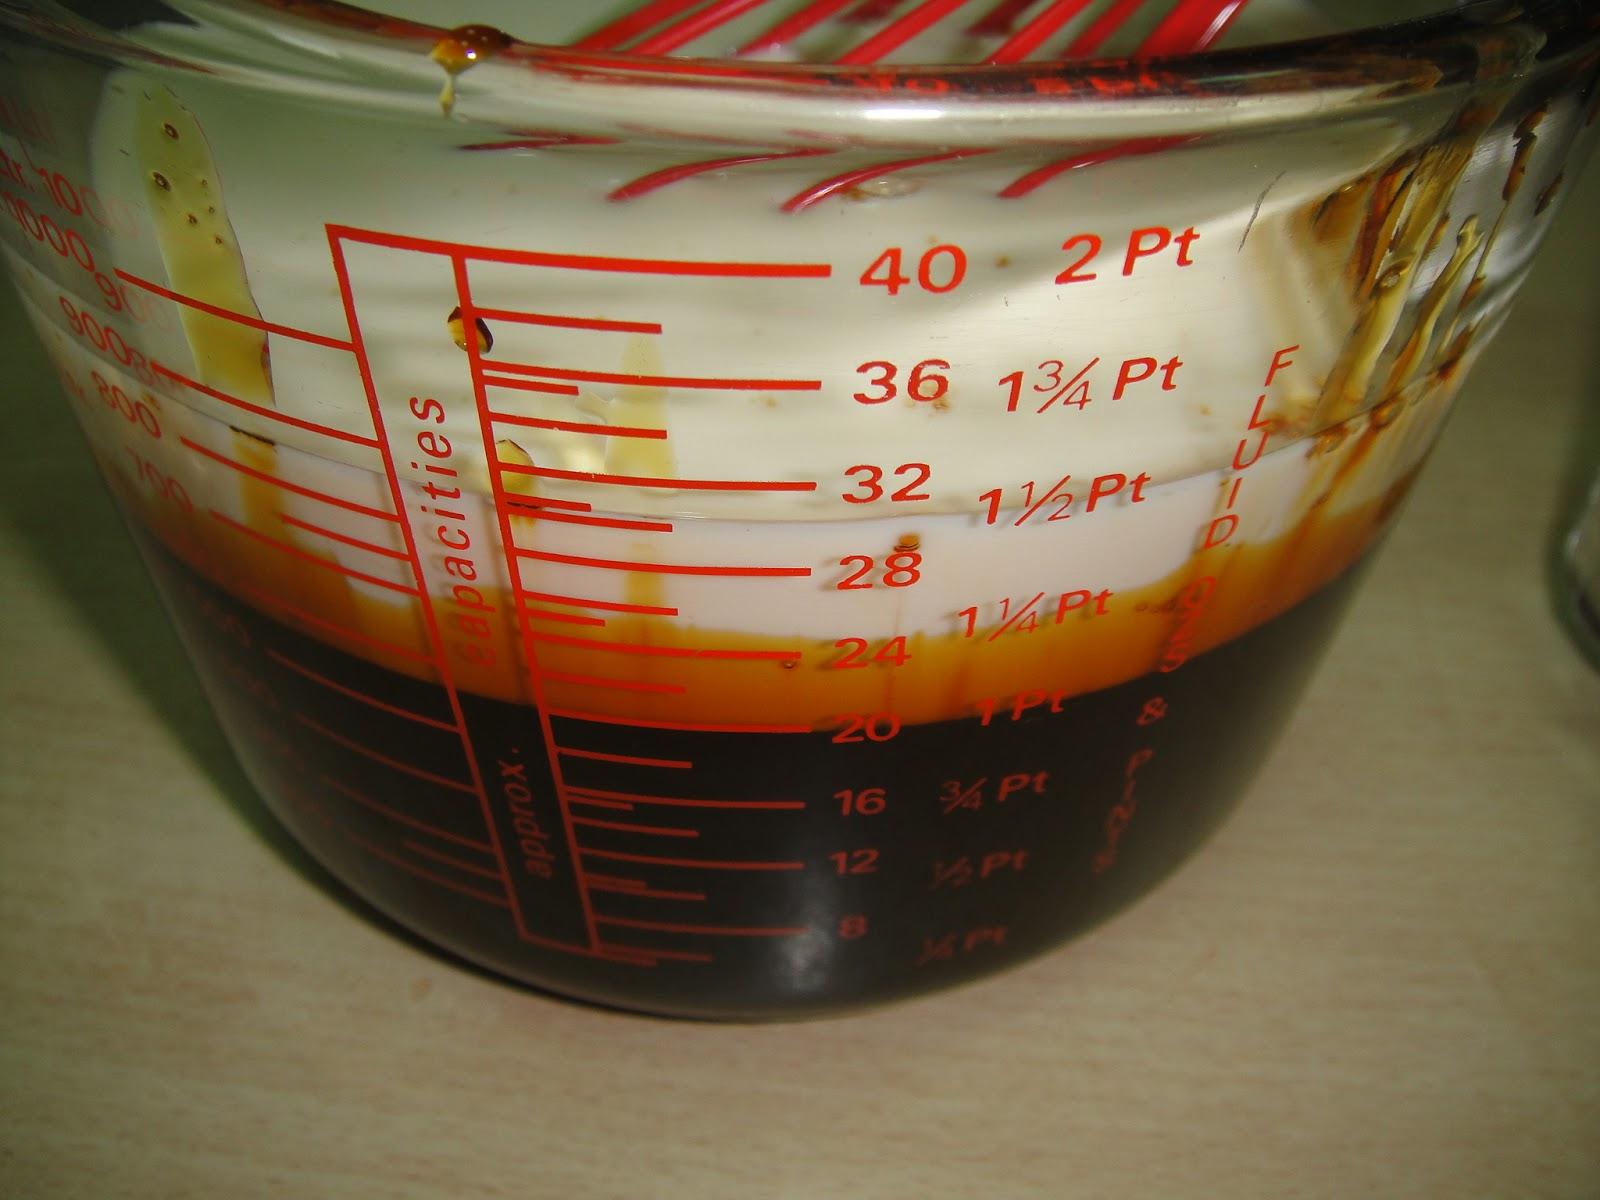 Maryam S Culinary Wonders 242 Date Molasses And Cardamom